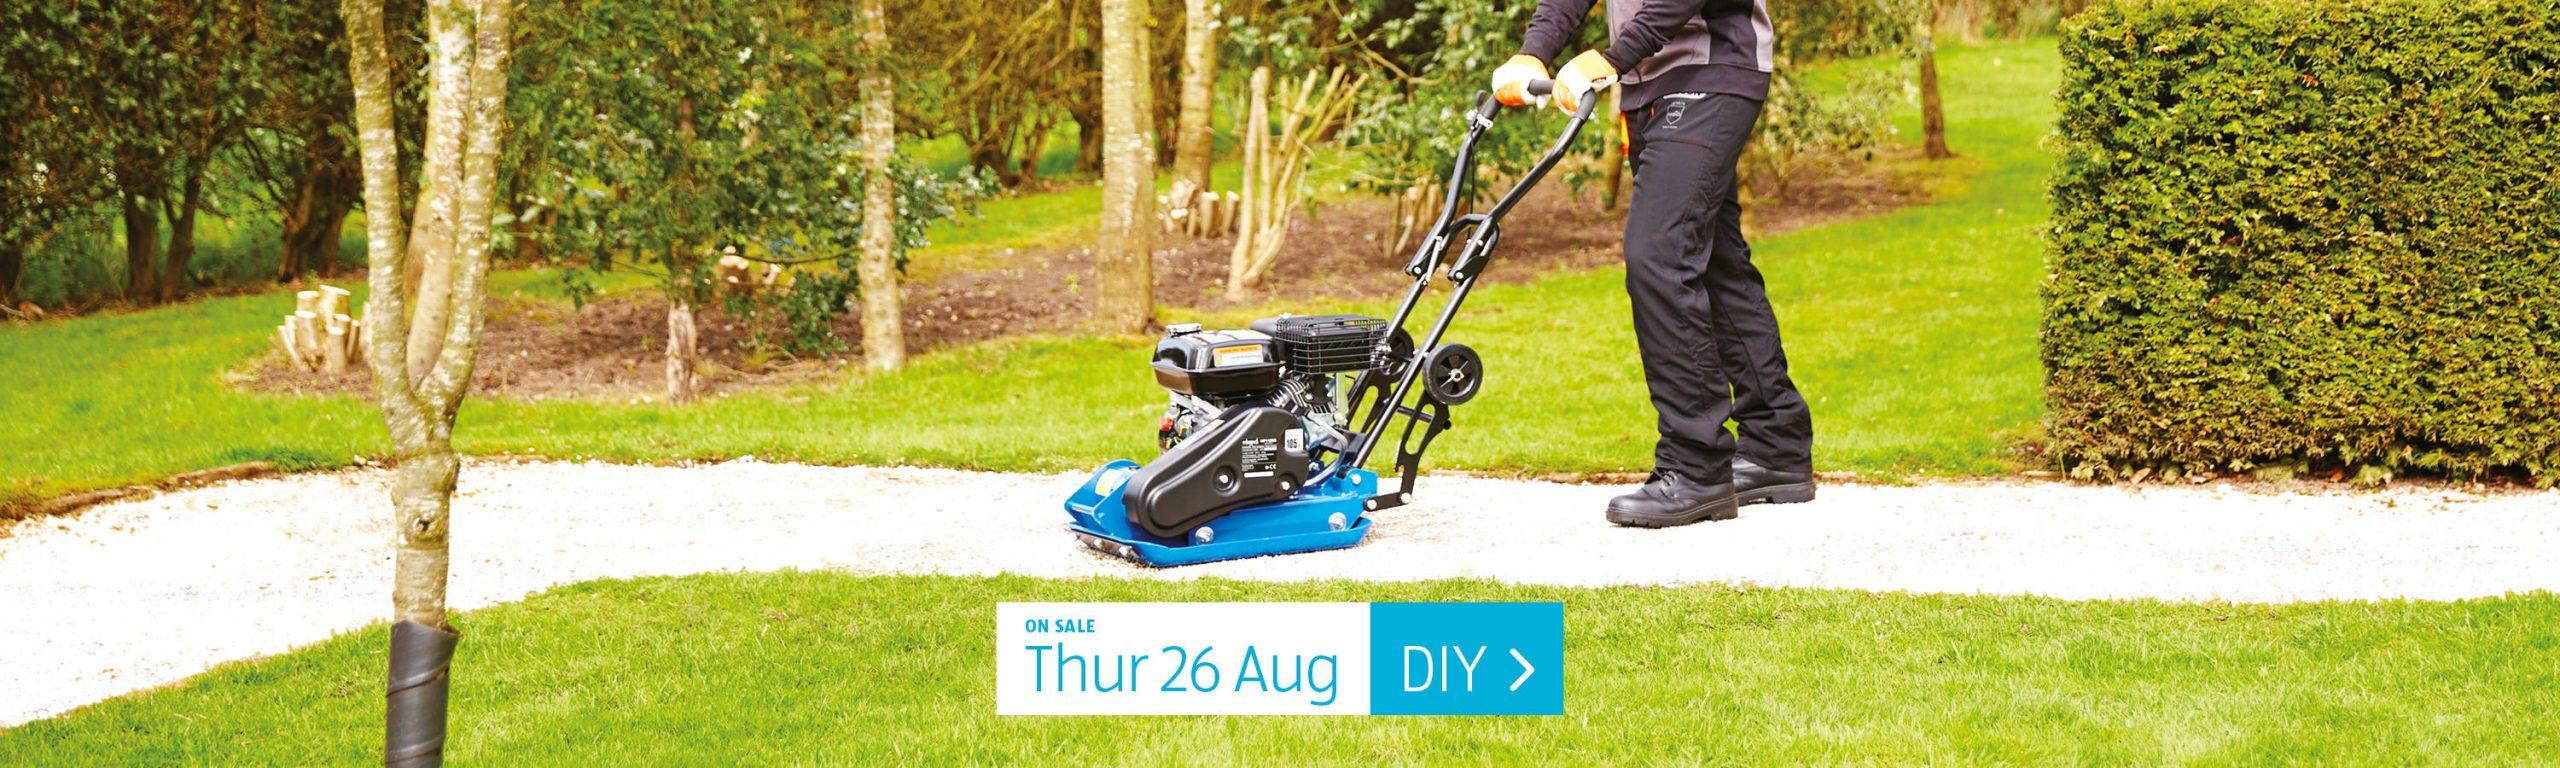 ALDI DIY 26th August 2021 ALDI Thursday Offers